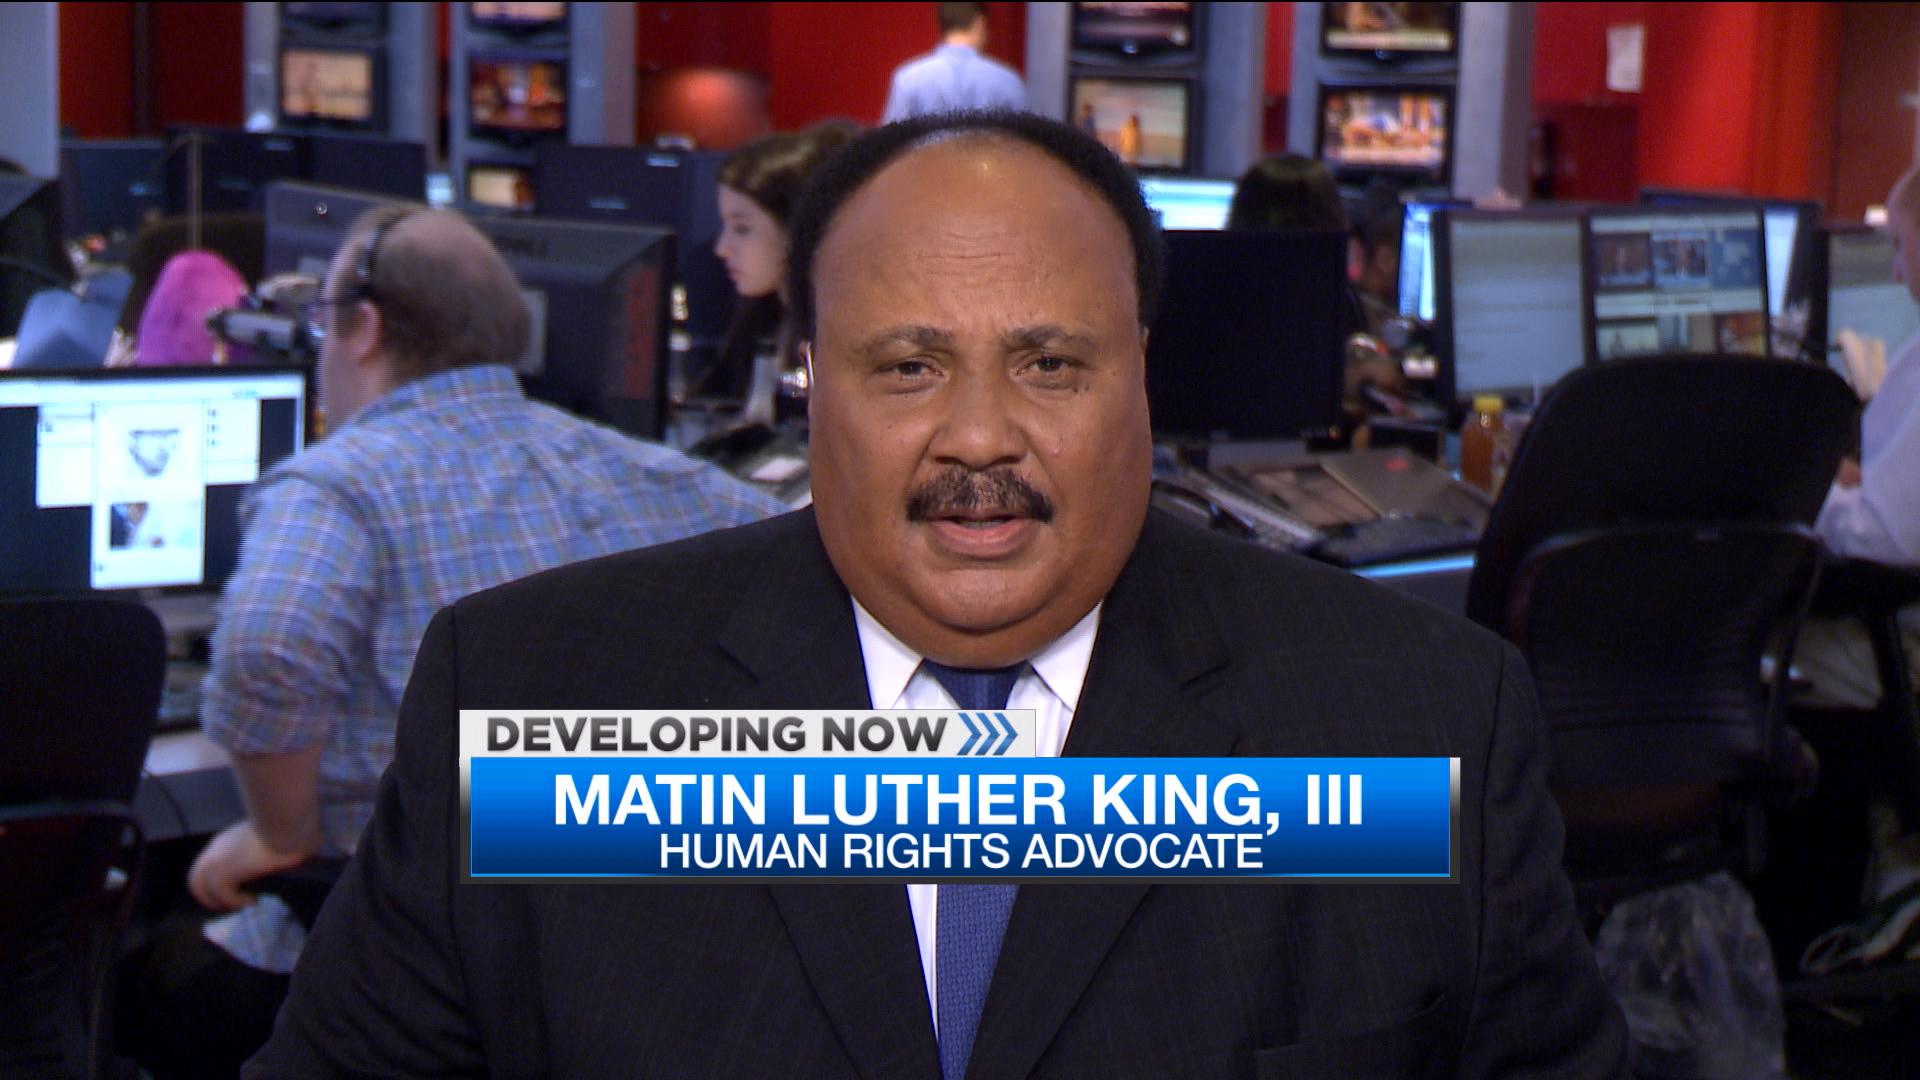 MLK III: US embraces a culture of violence